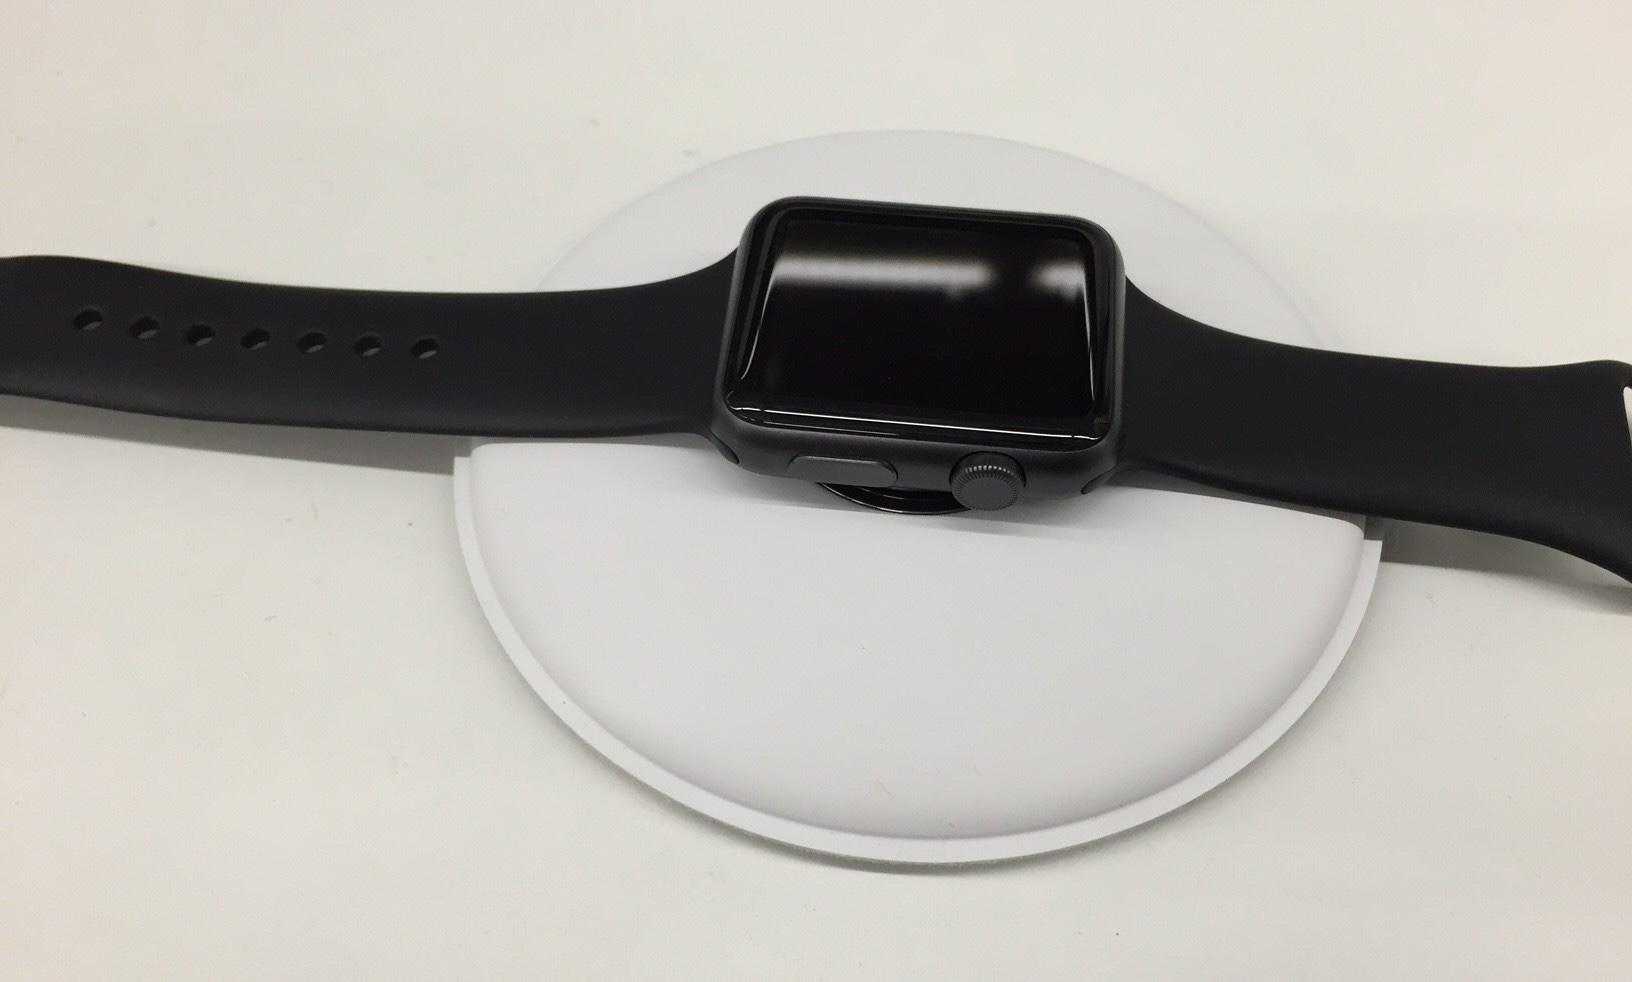 applewatchdock-new-3